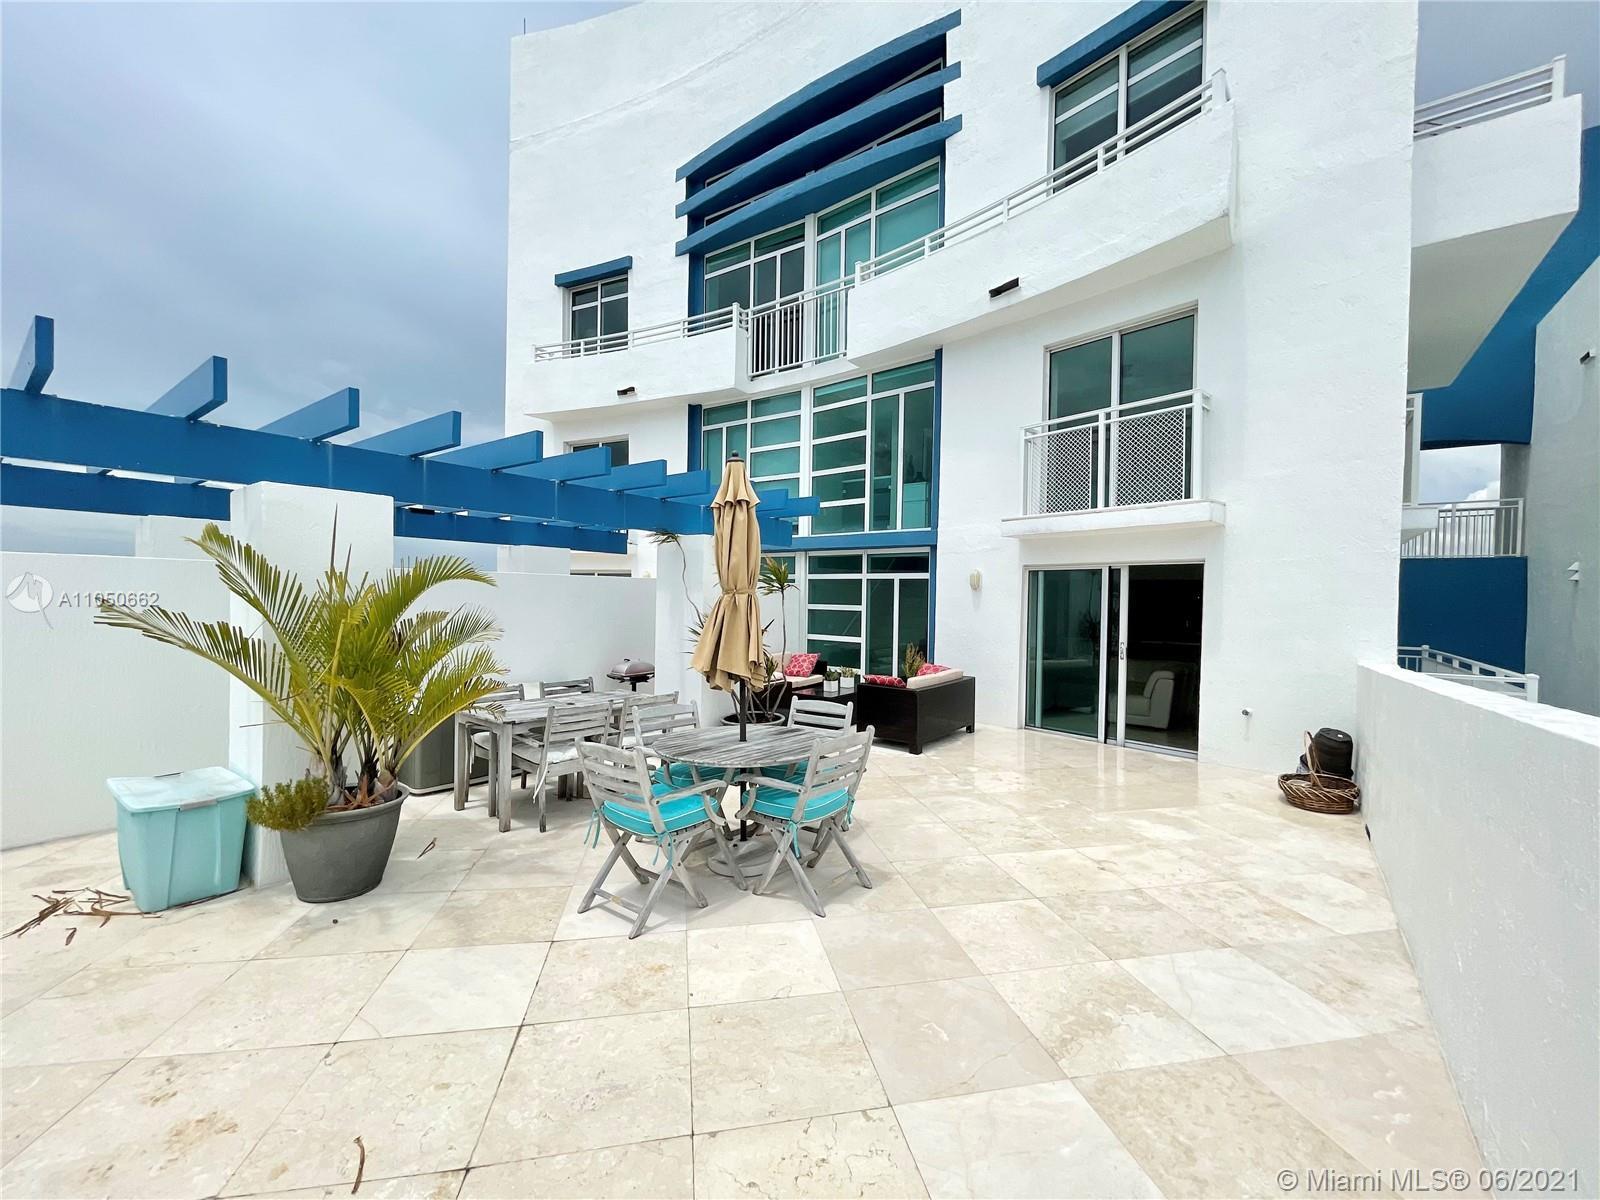 Private 700 sq/ft Terrace